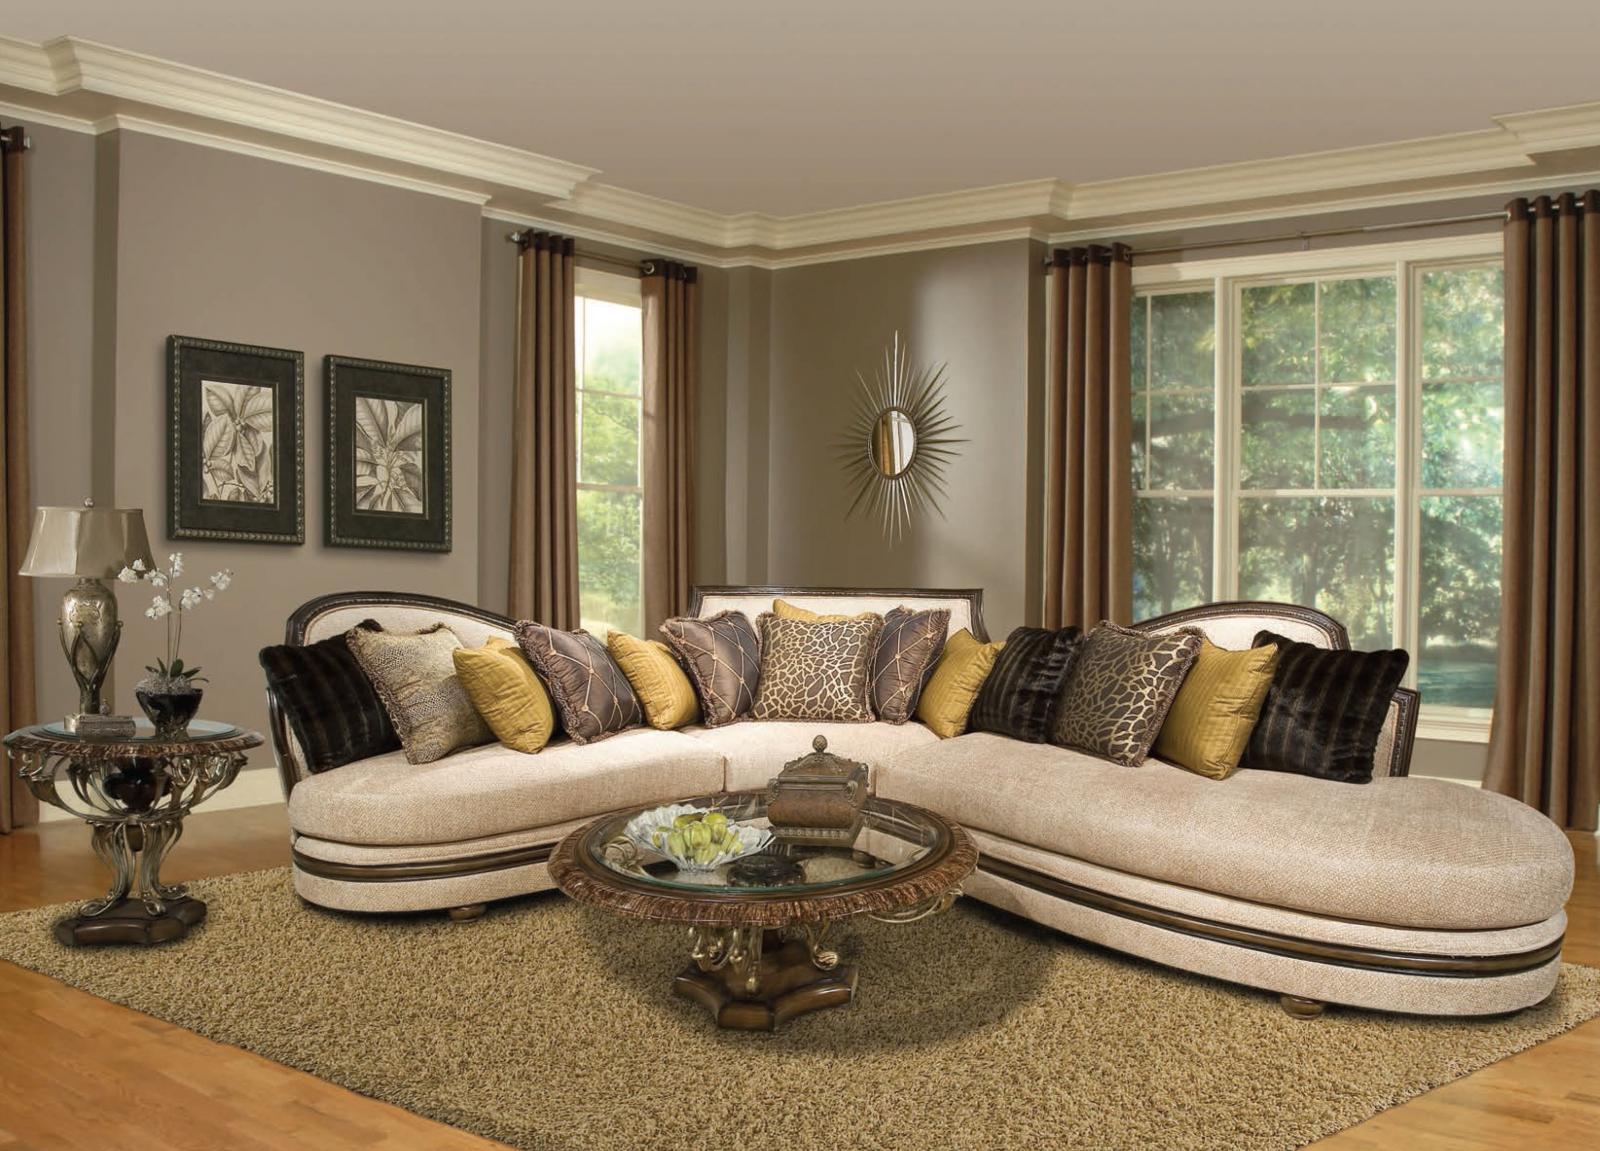 benetti s ravenna luxury cream sectional sofa dark wood special order left